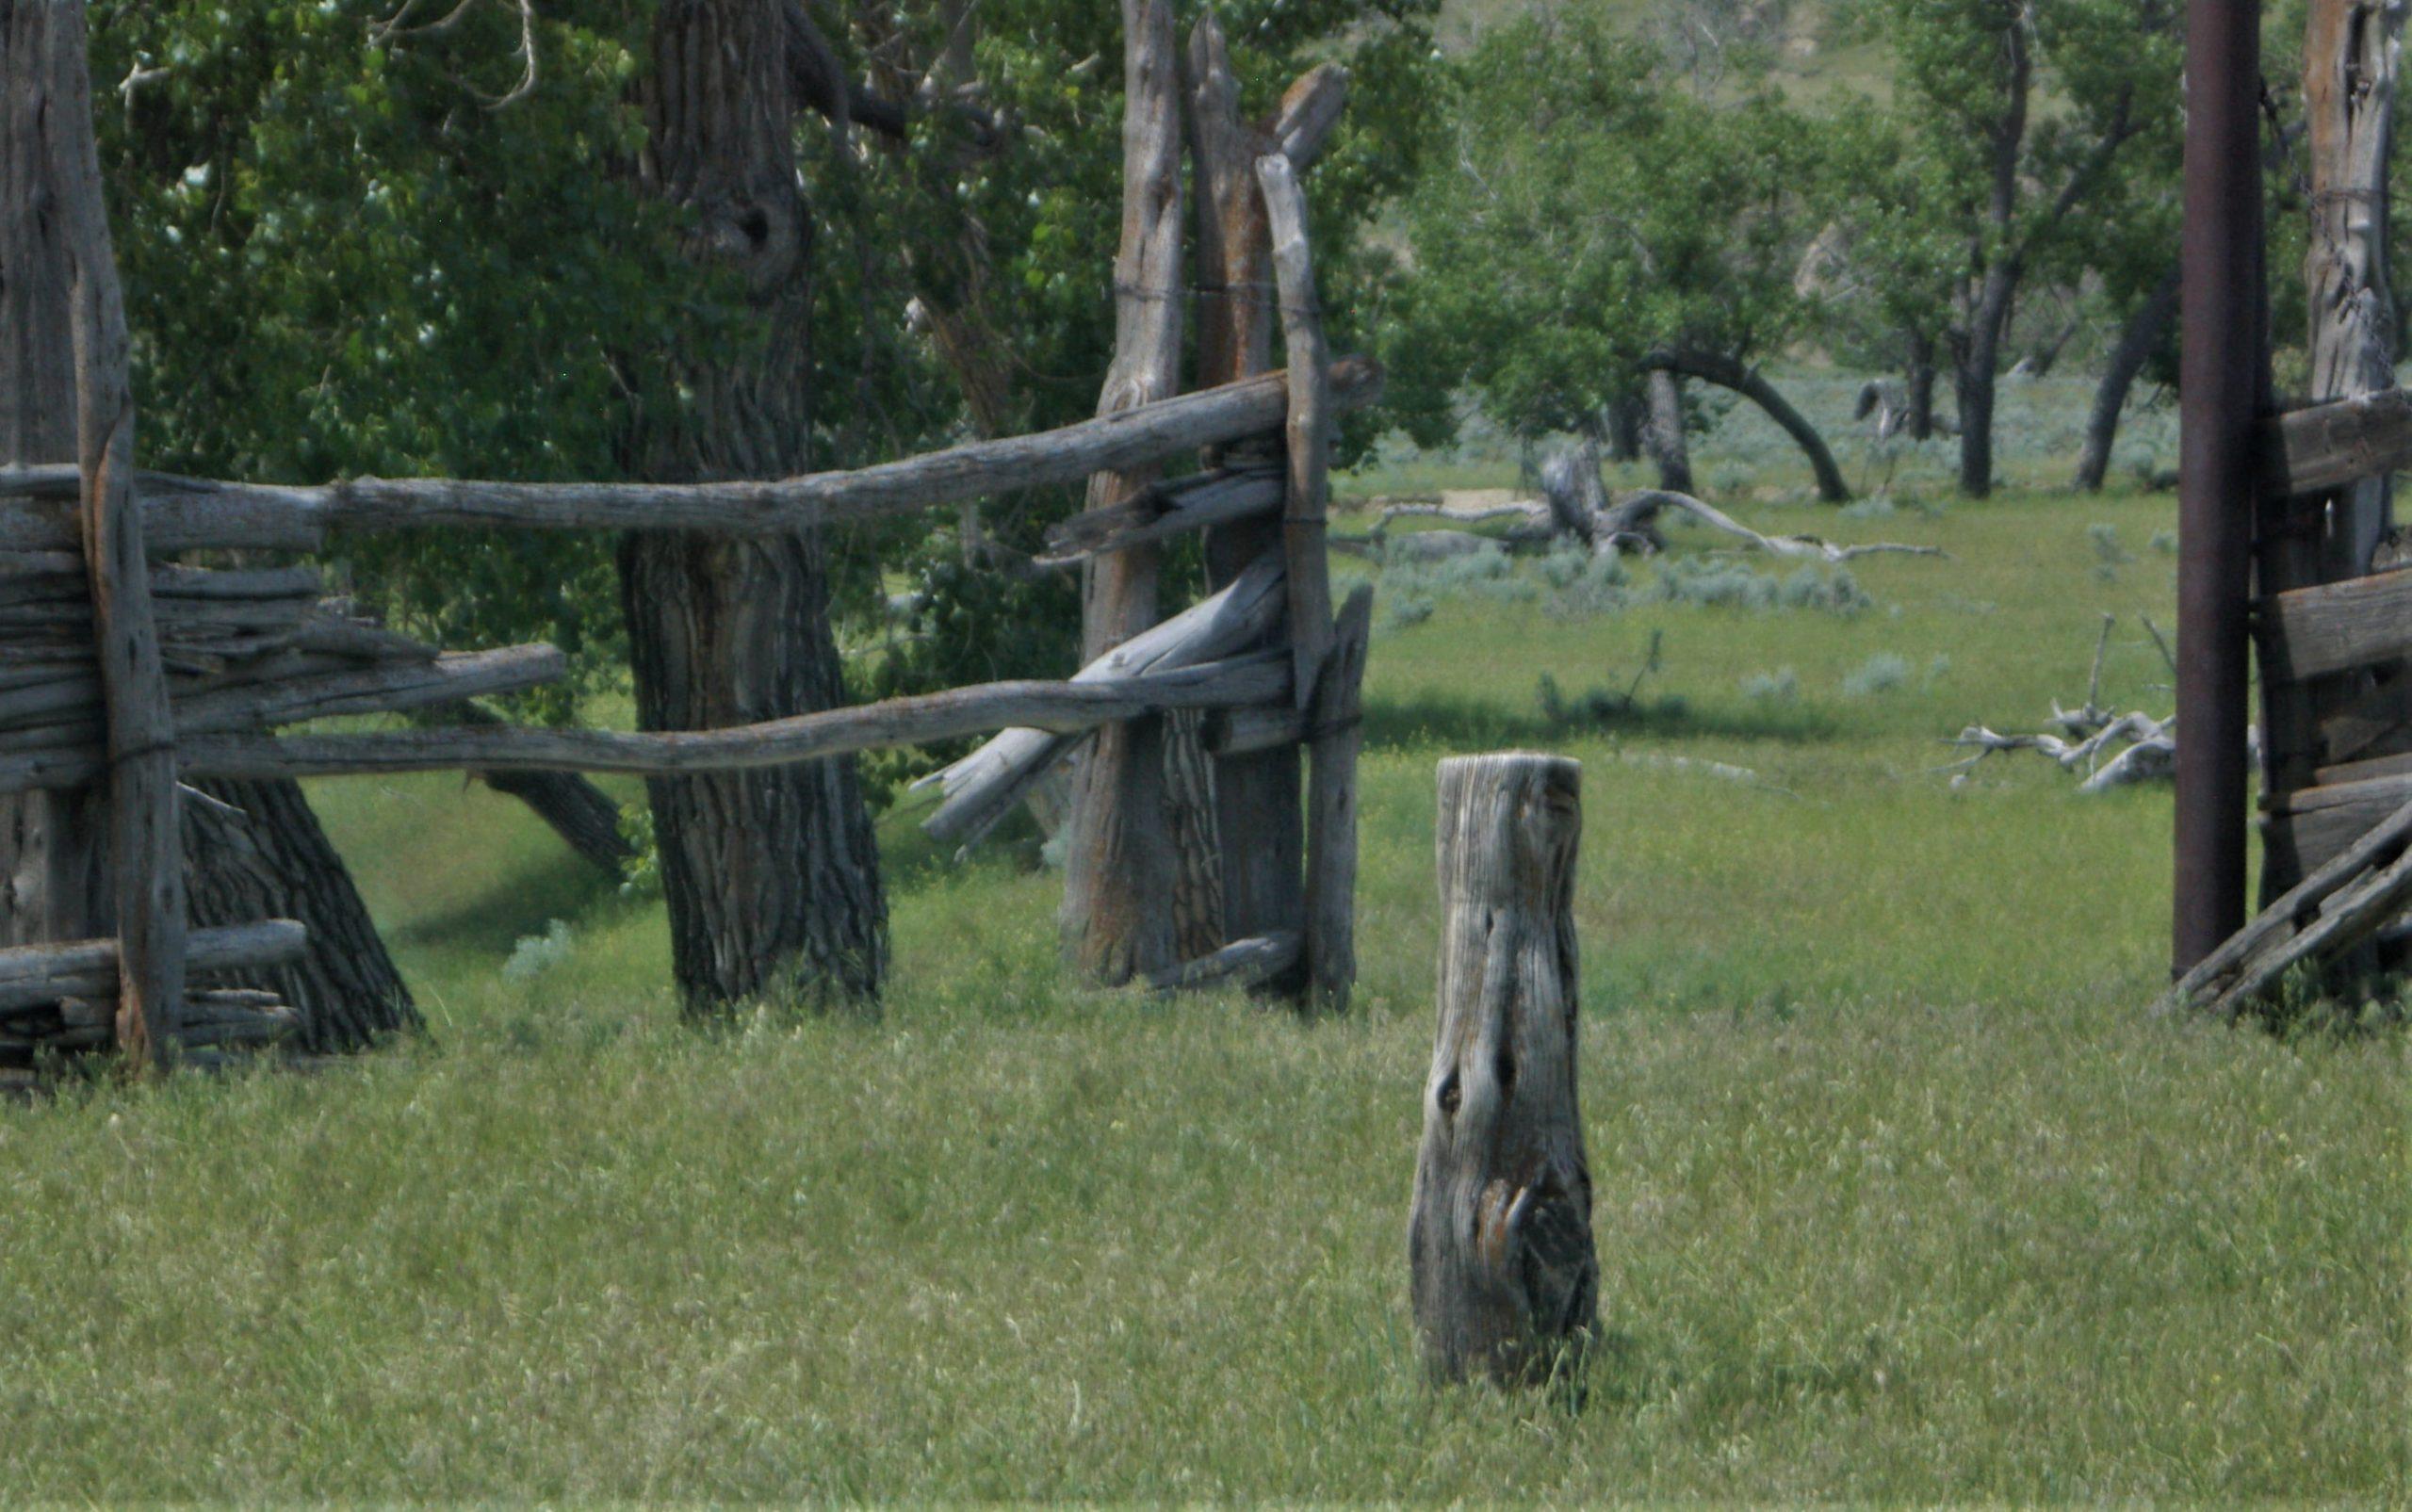 fencepost post tamp